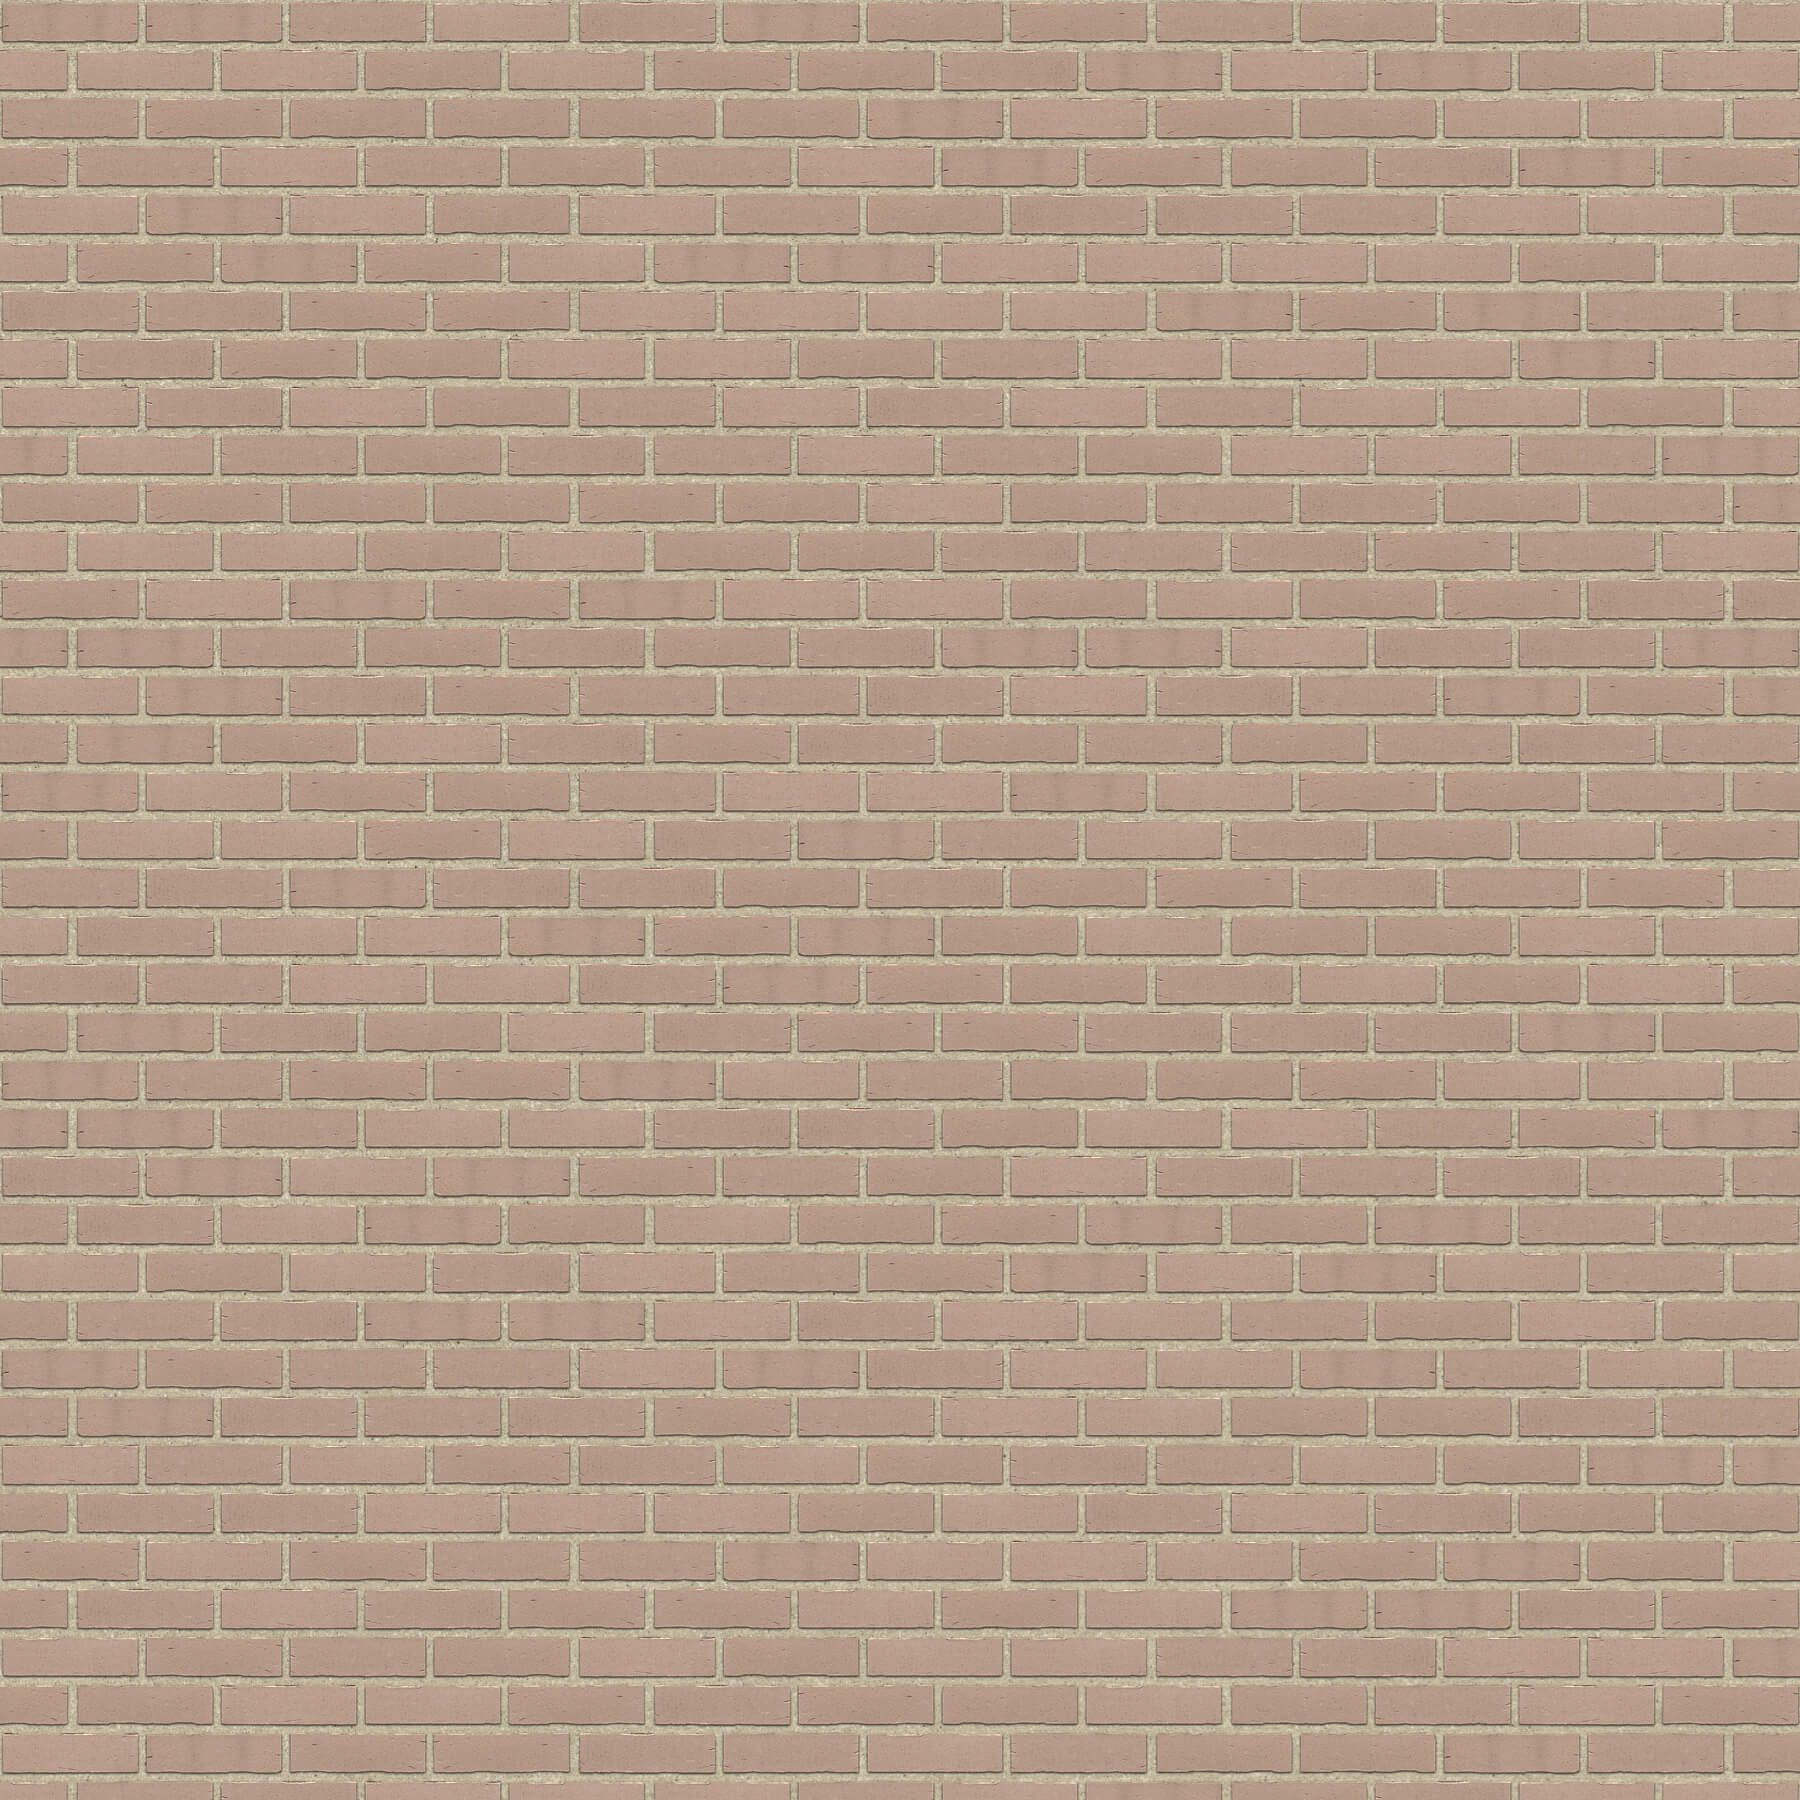 Dekorativna cigla listela FeldHaus Klinker r-760 nf Bez